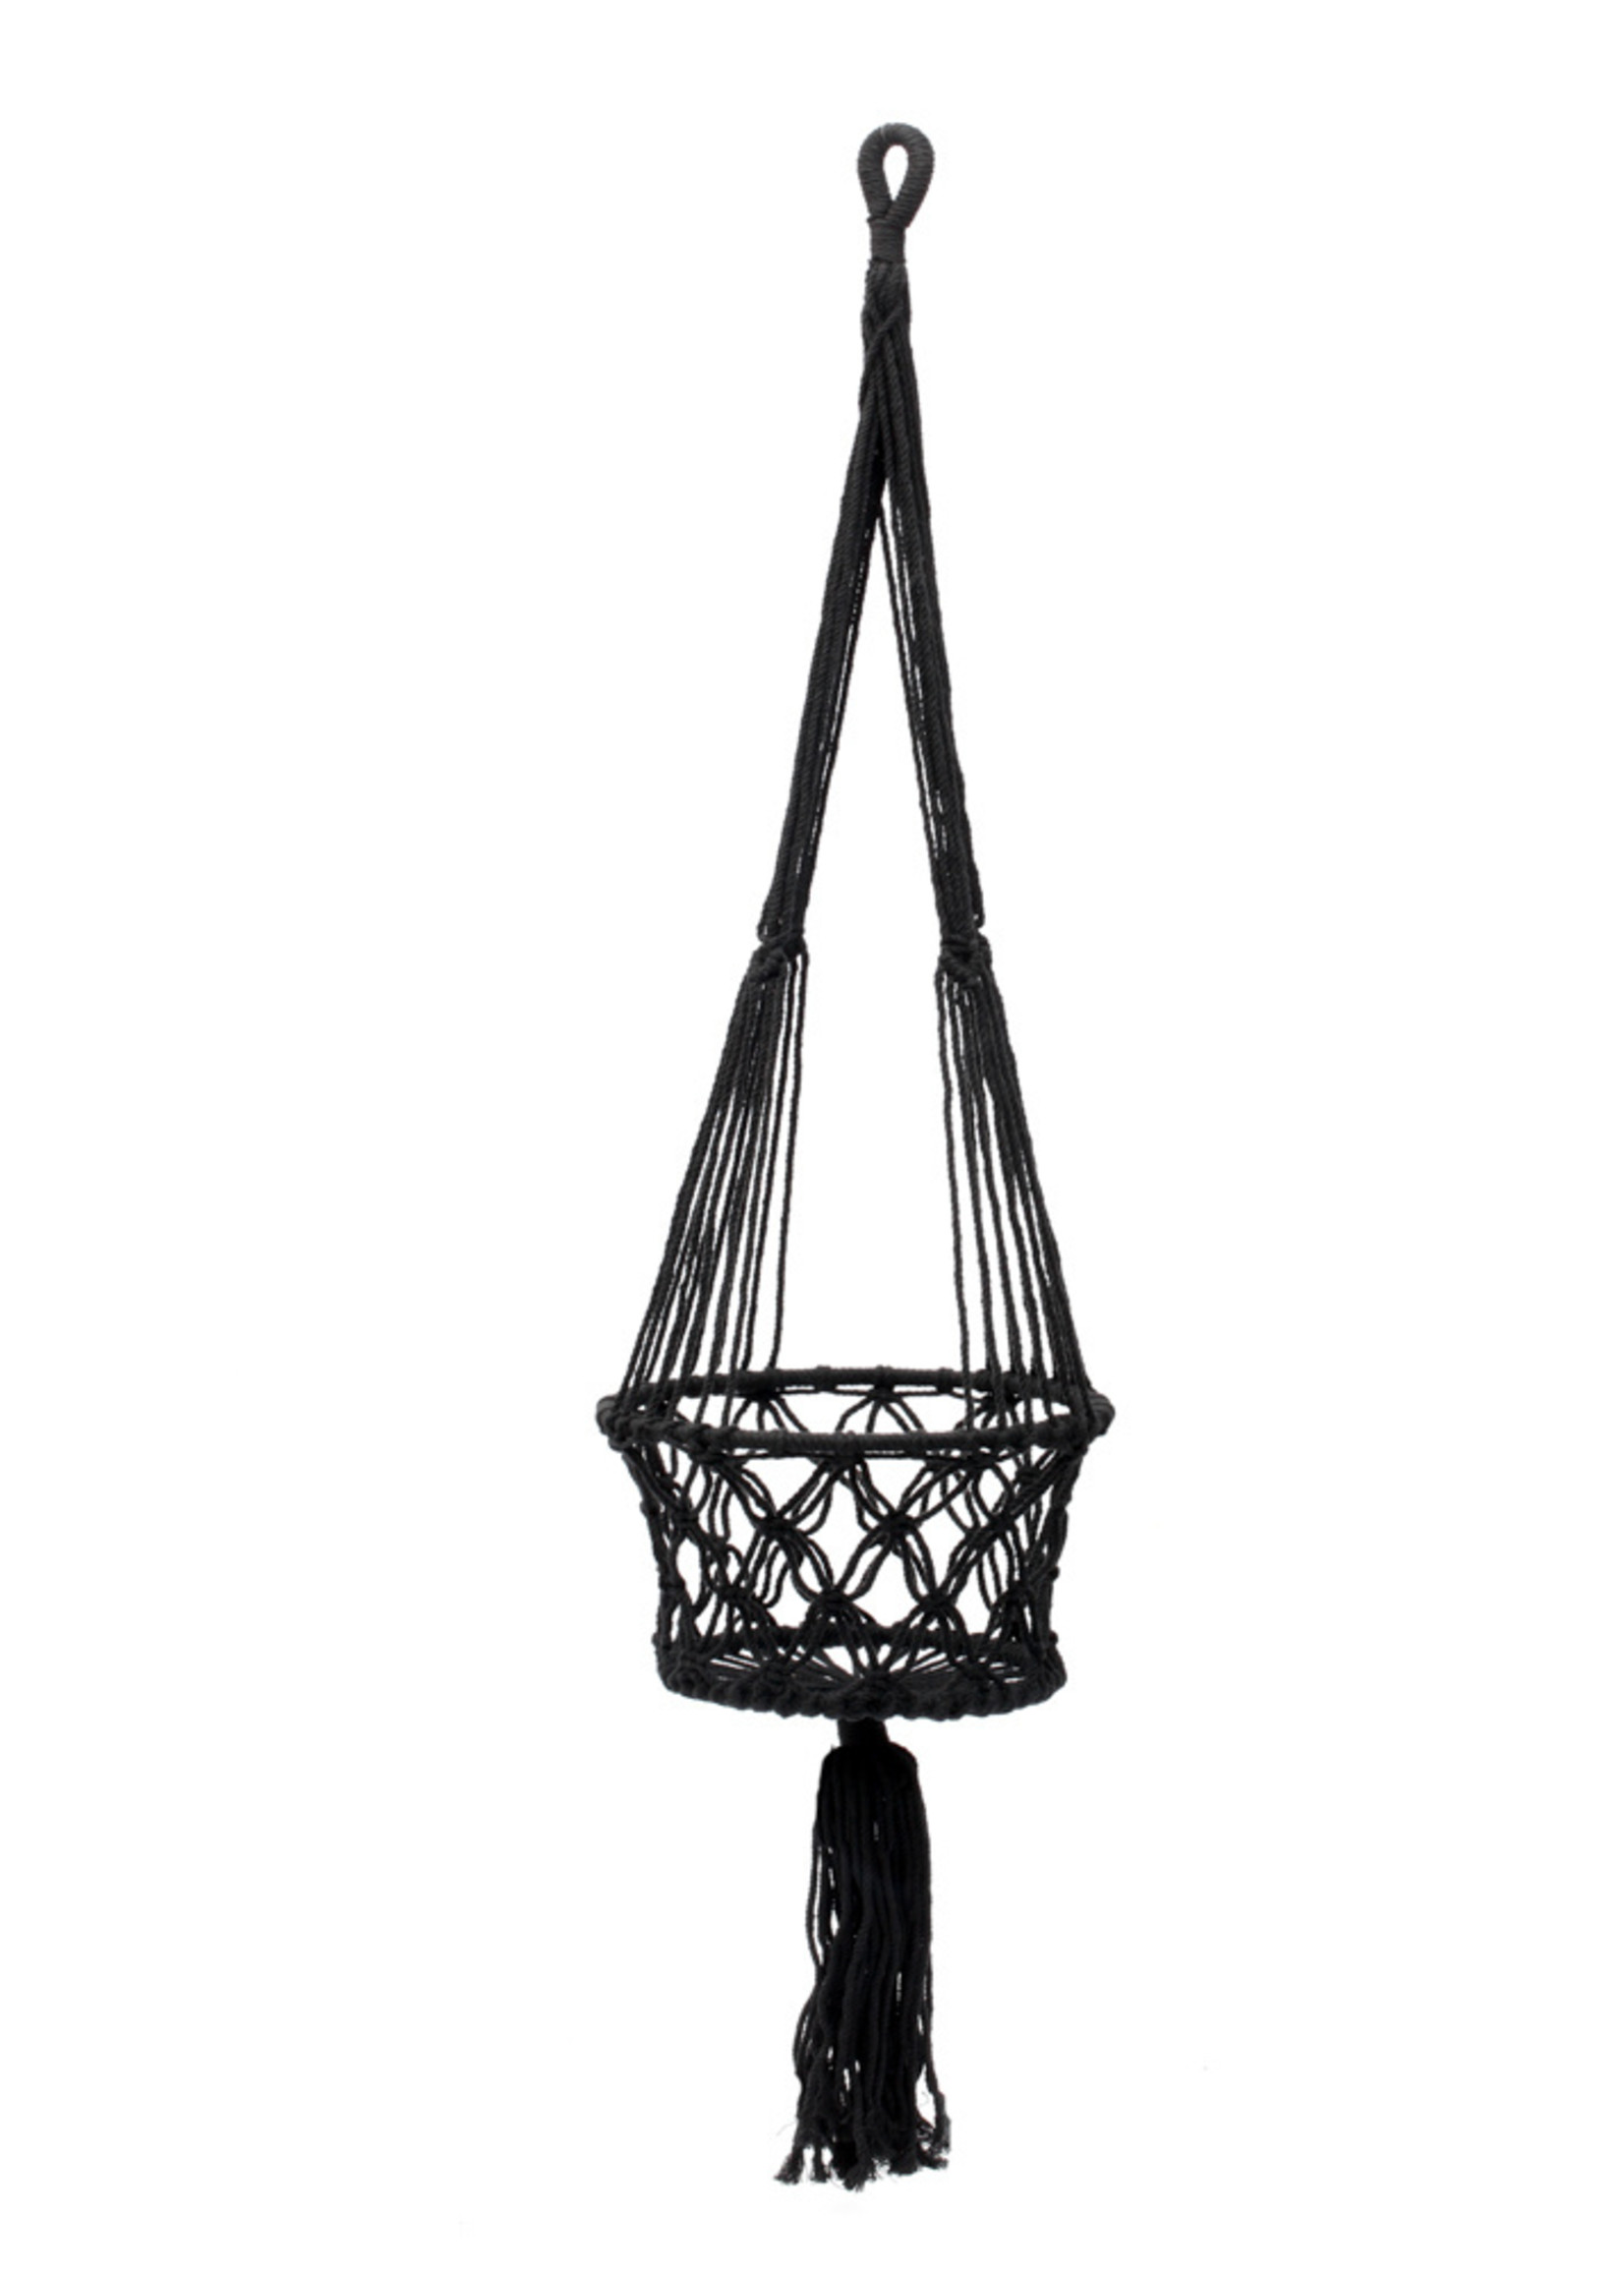 The Macrame Plant Holder - Black - L